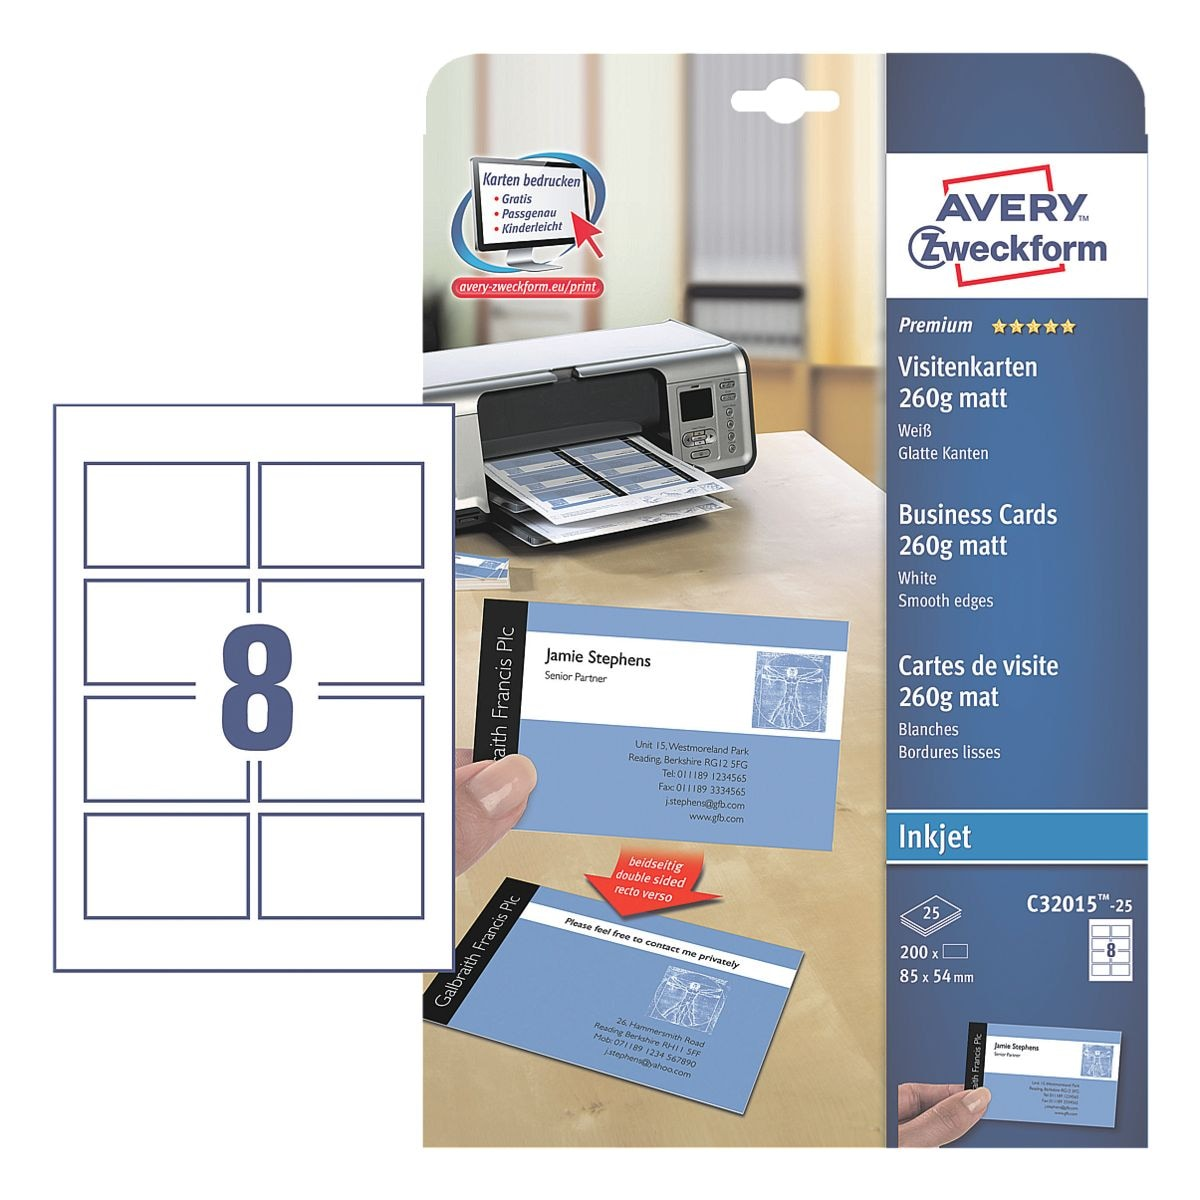 Avery Zweckform Visitenkarten C32015-25